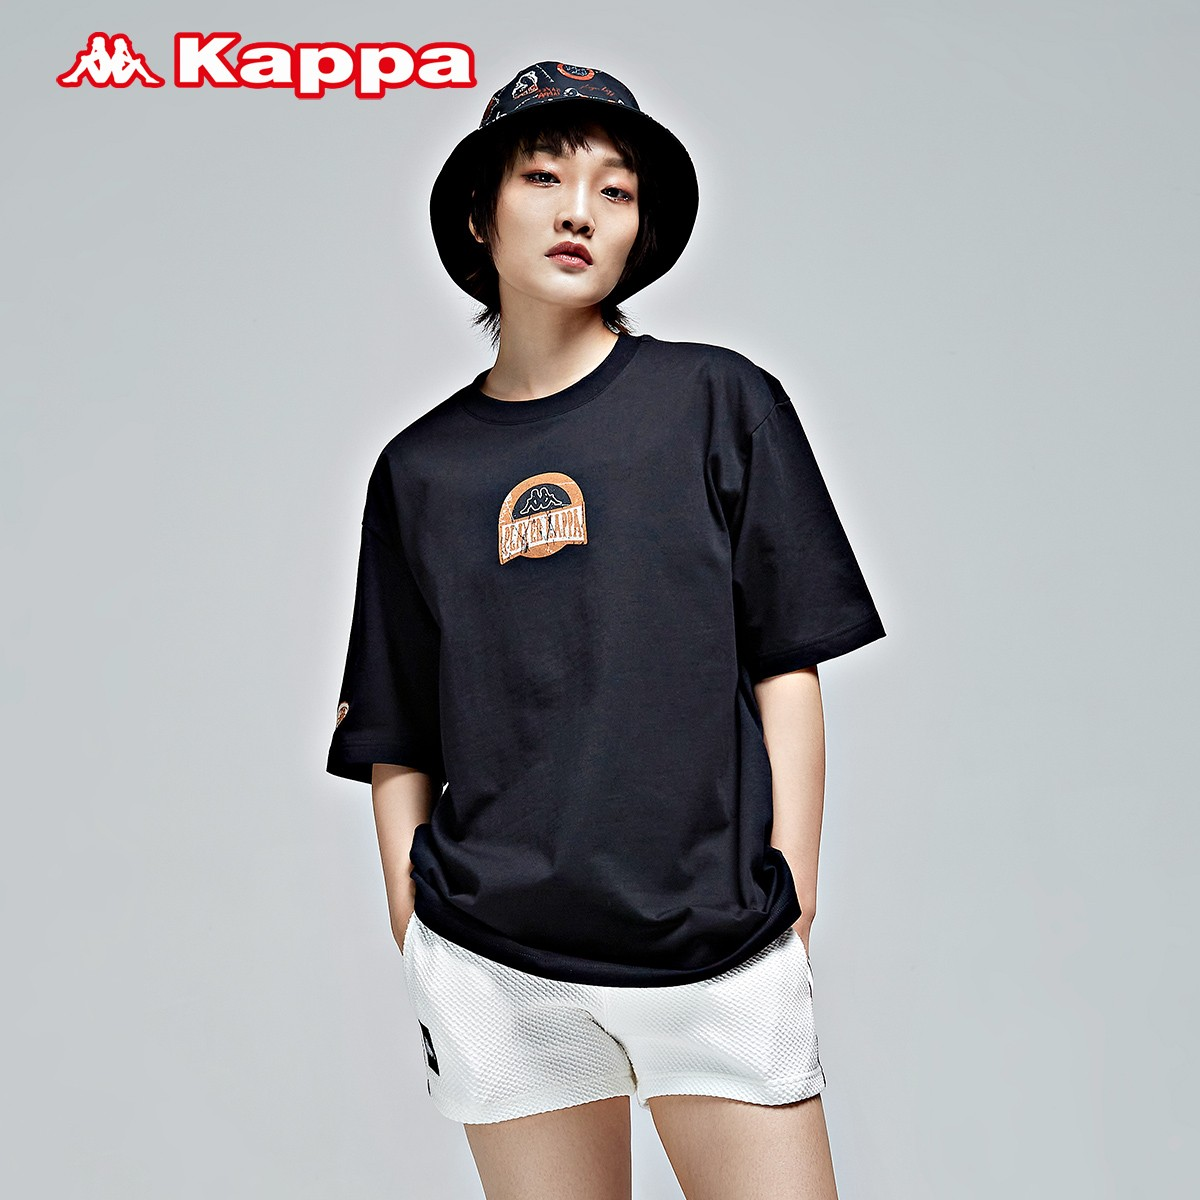 Kappa 卡帕 玩家系列 K0BX2TD16D 男女运动T恤